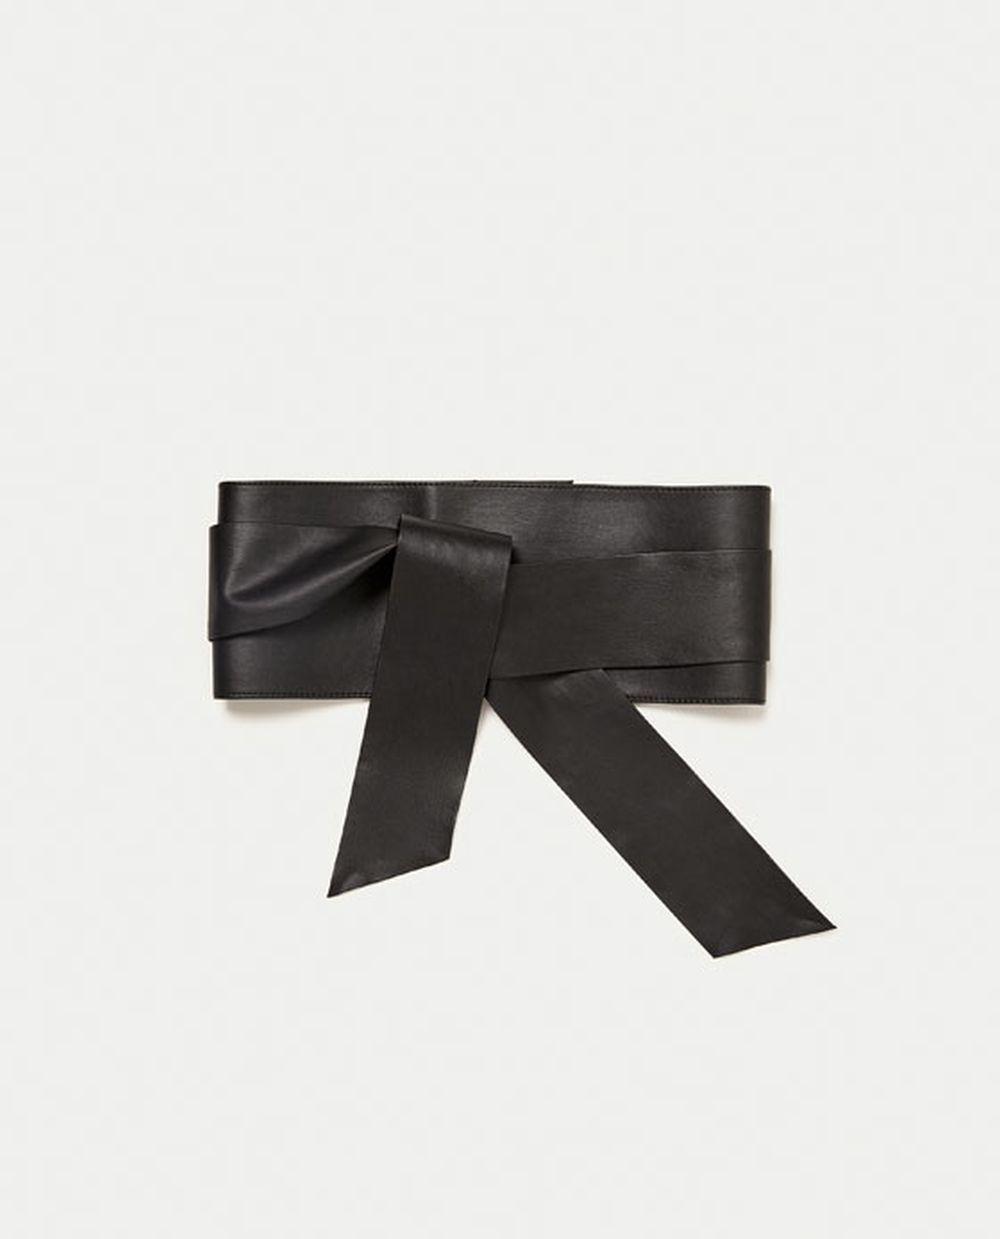 Fajín de Zara (17.95 euros).